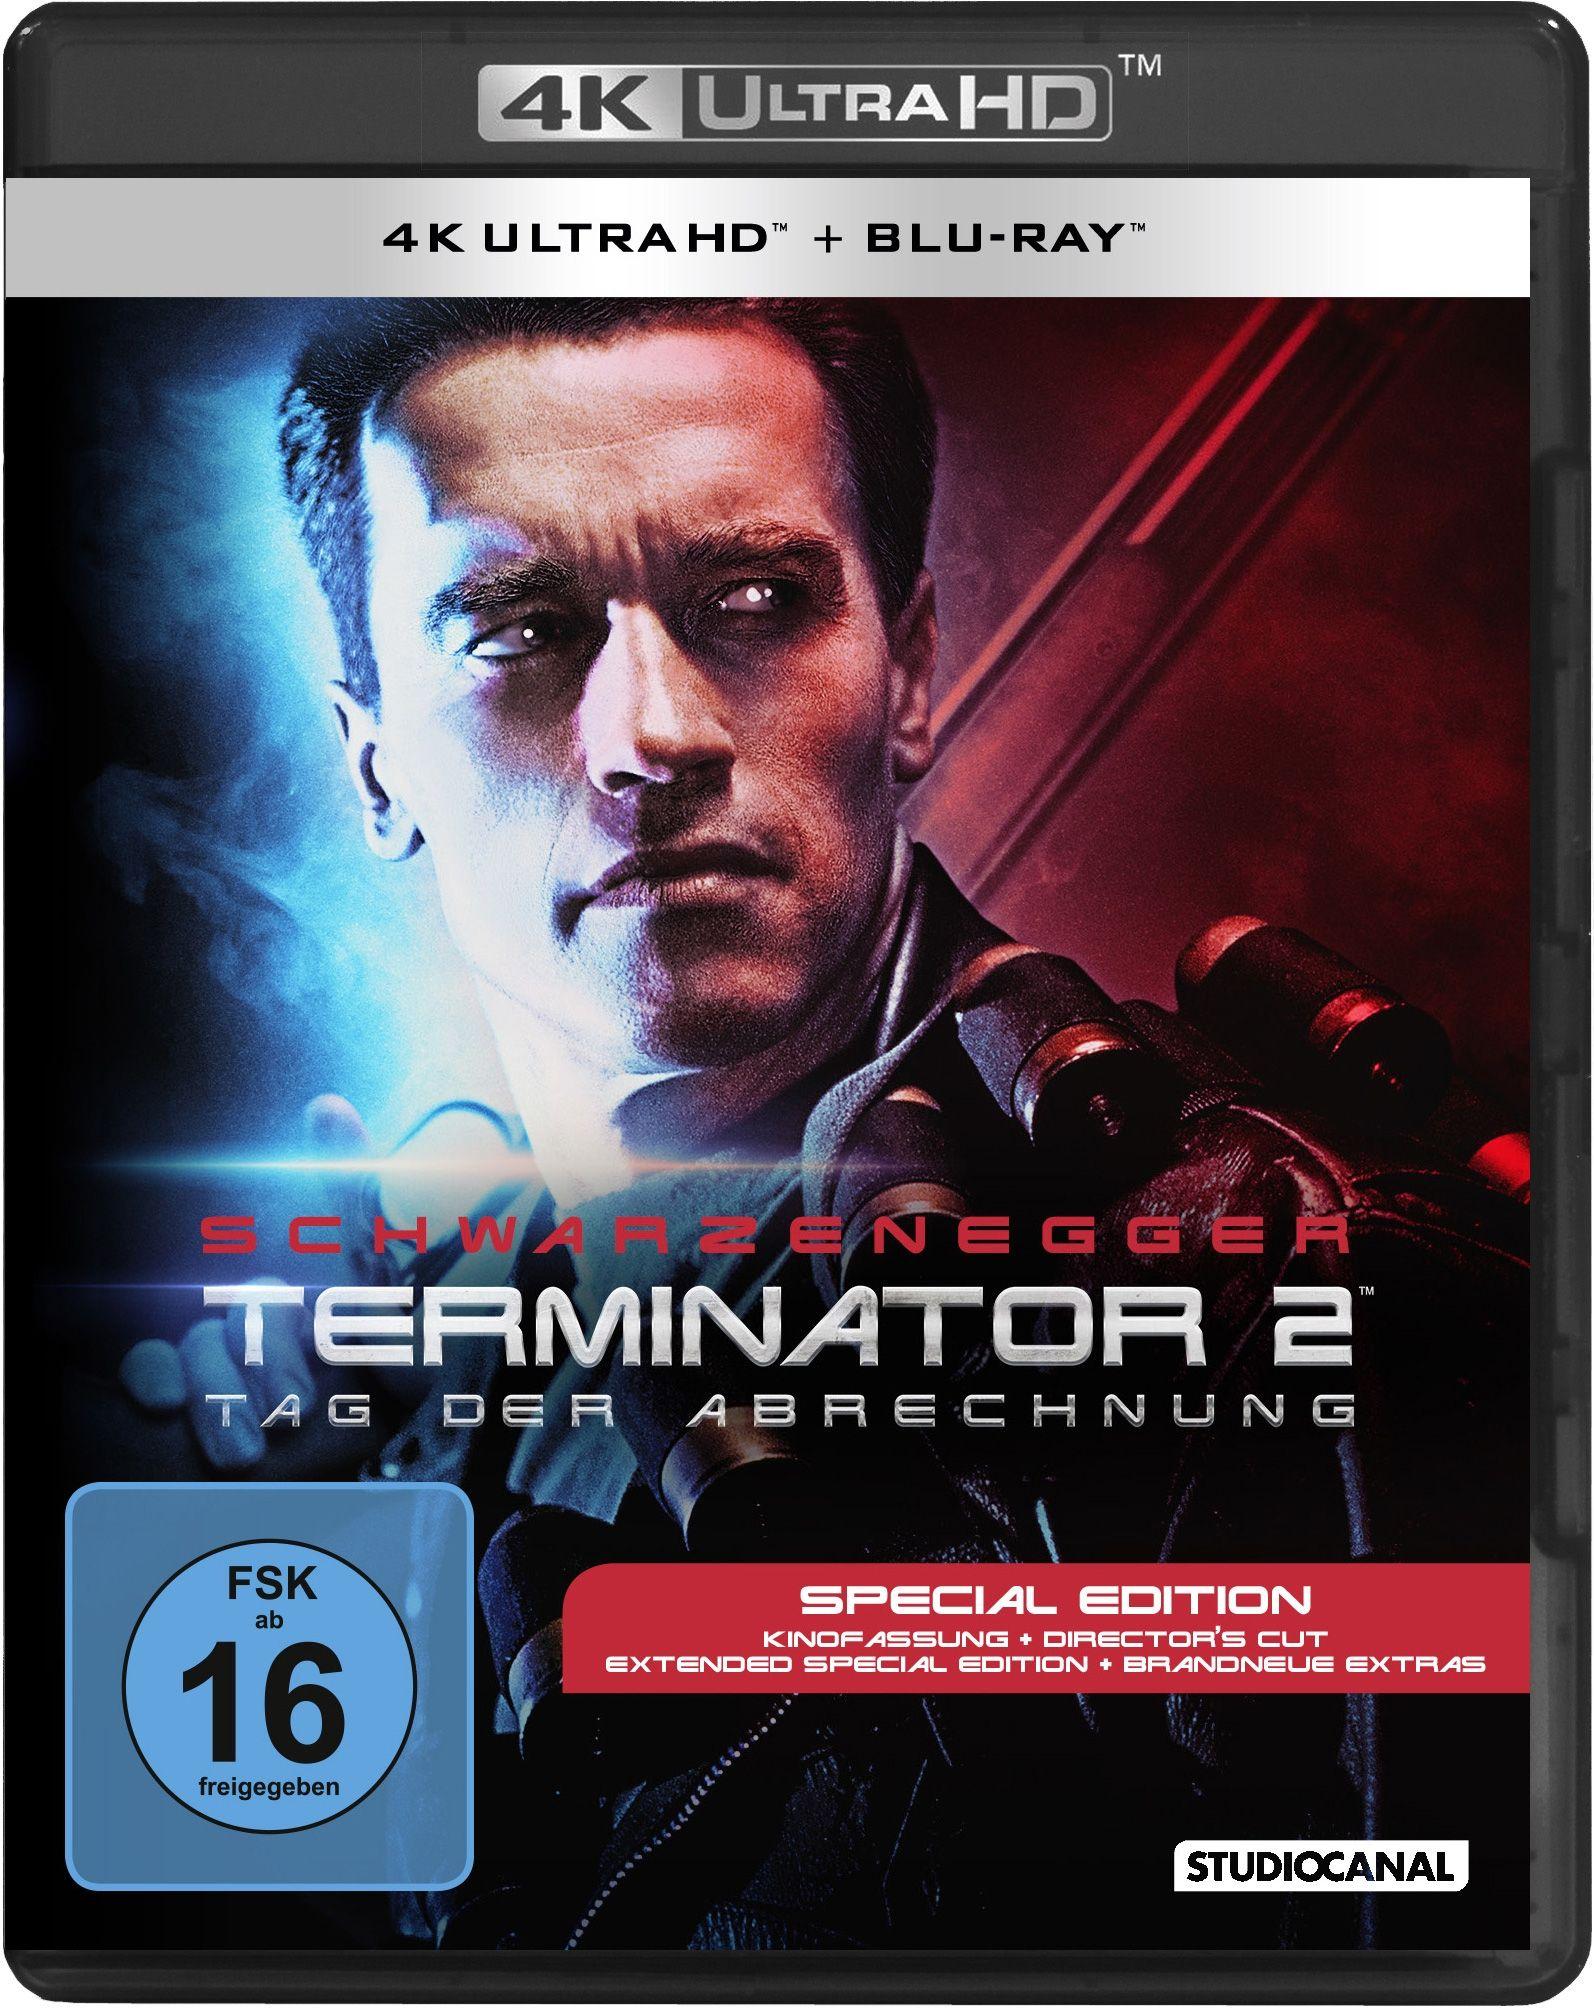 Terminator 2 - Tag der Abrechnung (2 Discs) (UHD BLURAY + BLURAY)